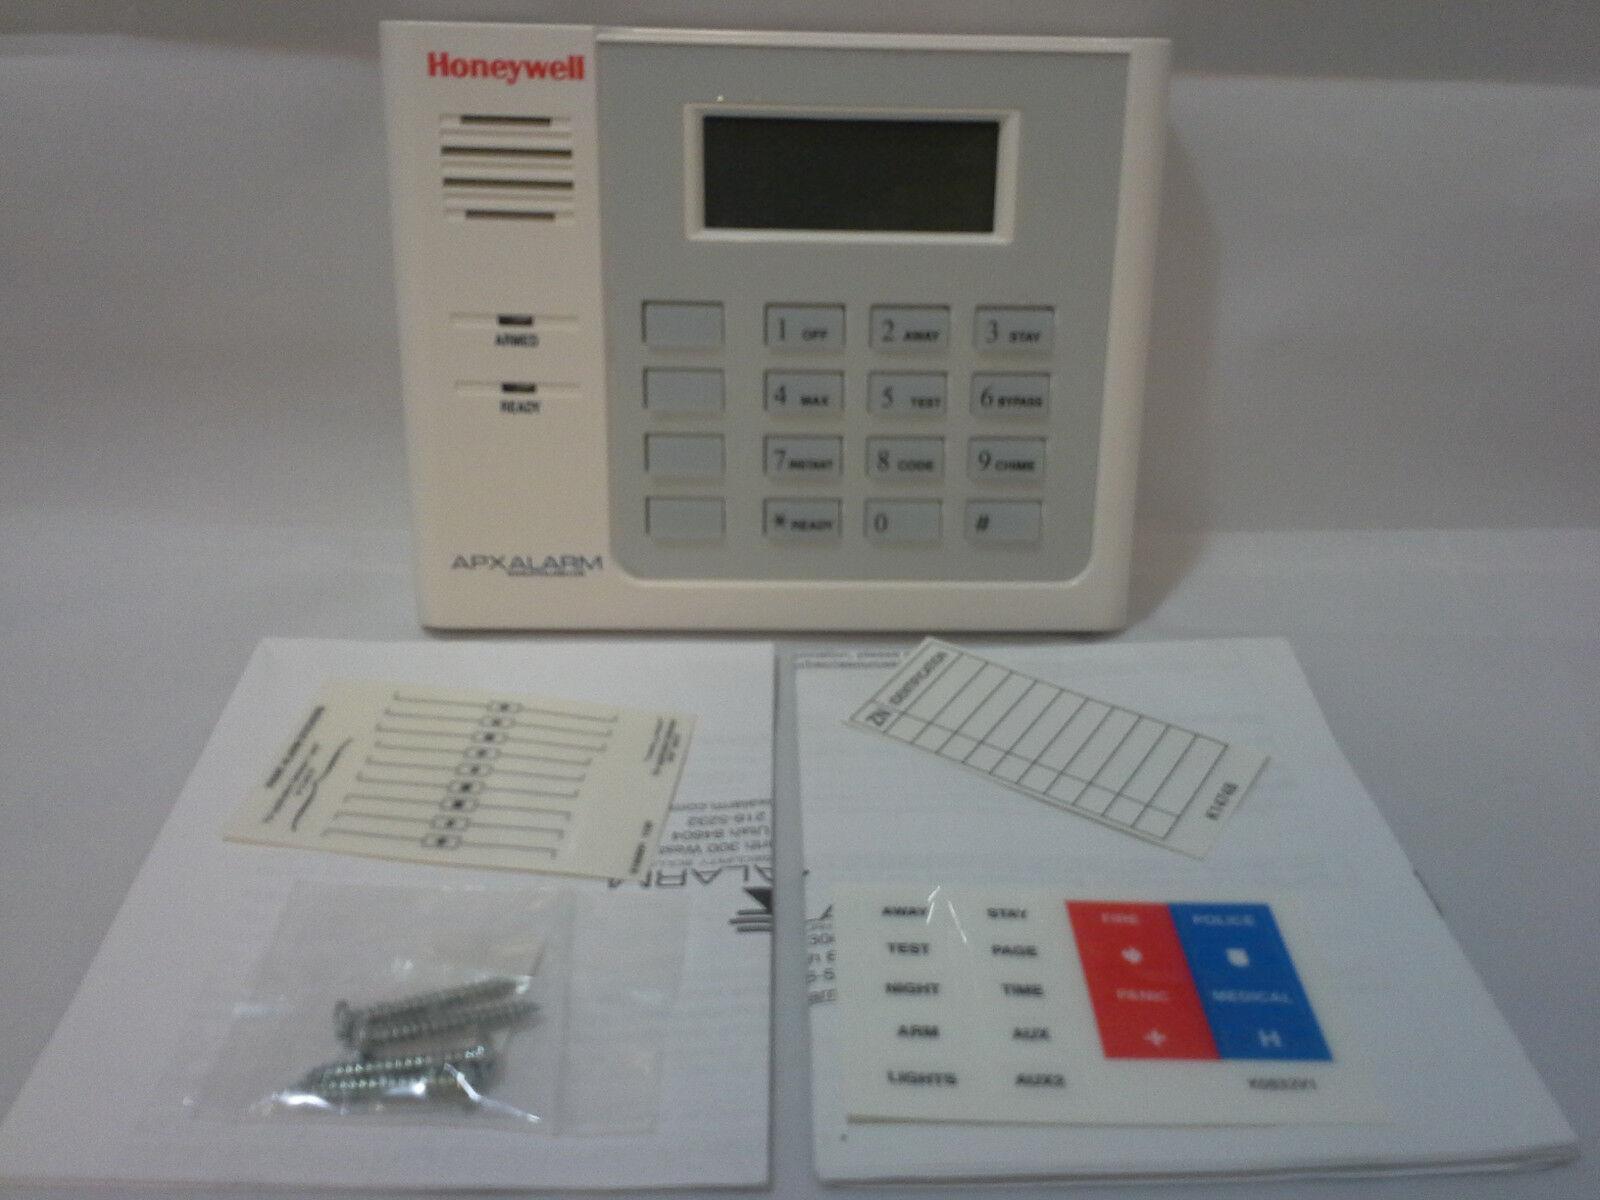 ademco vista 10p wiring diagram 1991 volvo 240 radio apx honeywell 6150rf keypad touchpad 15p 20p